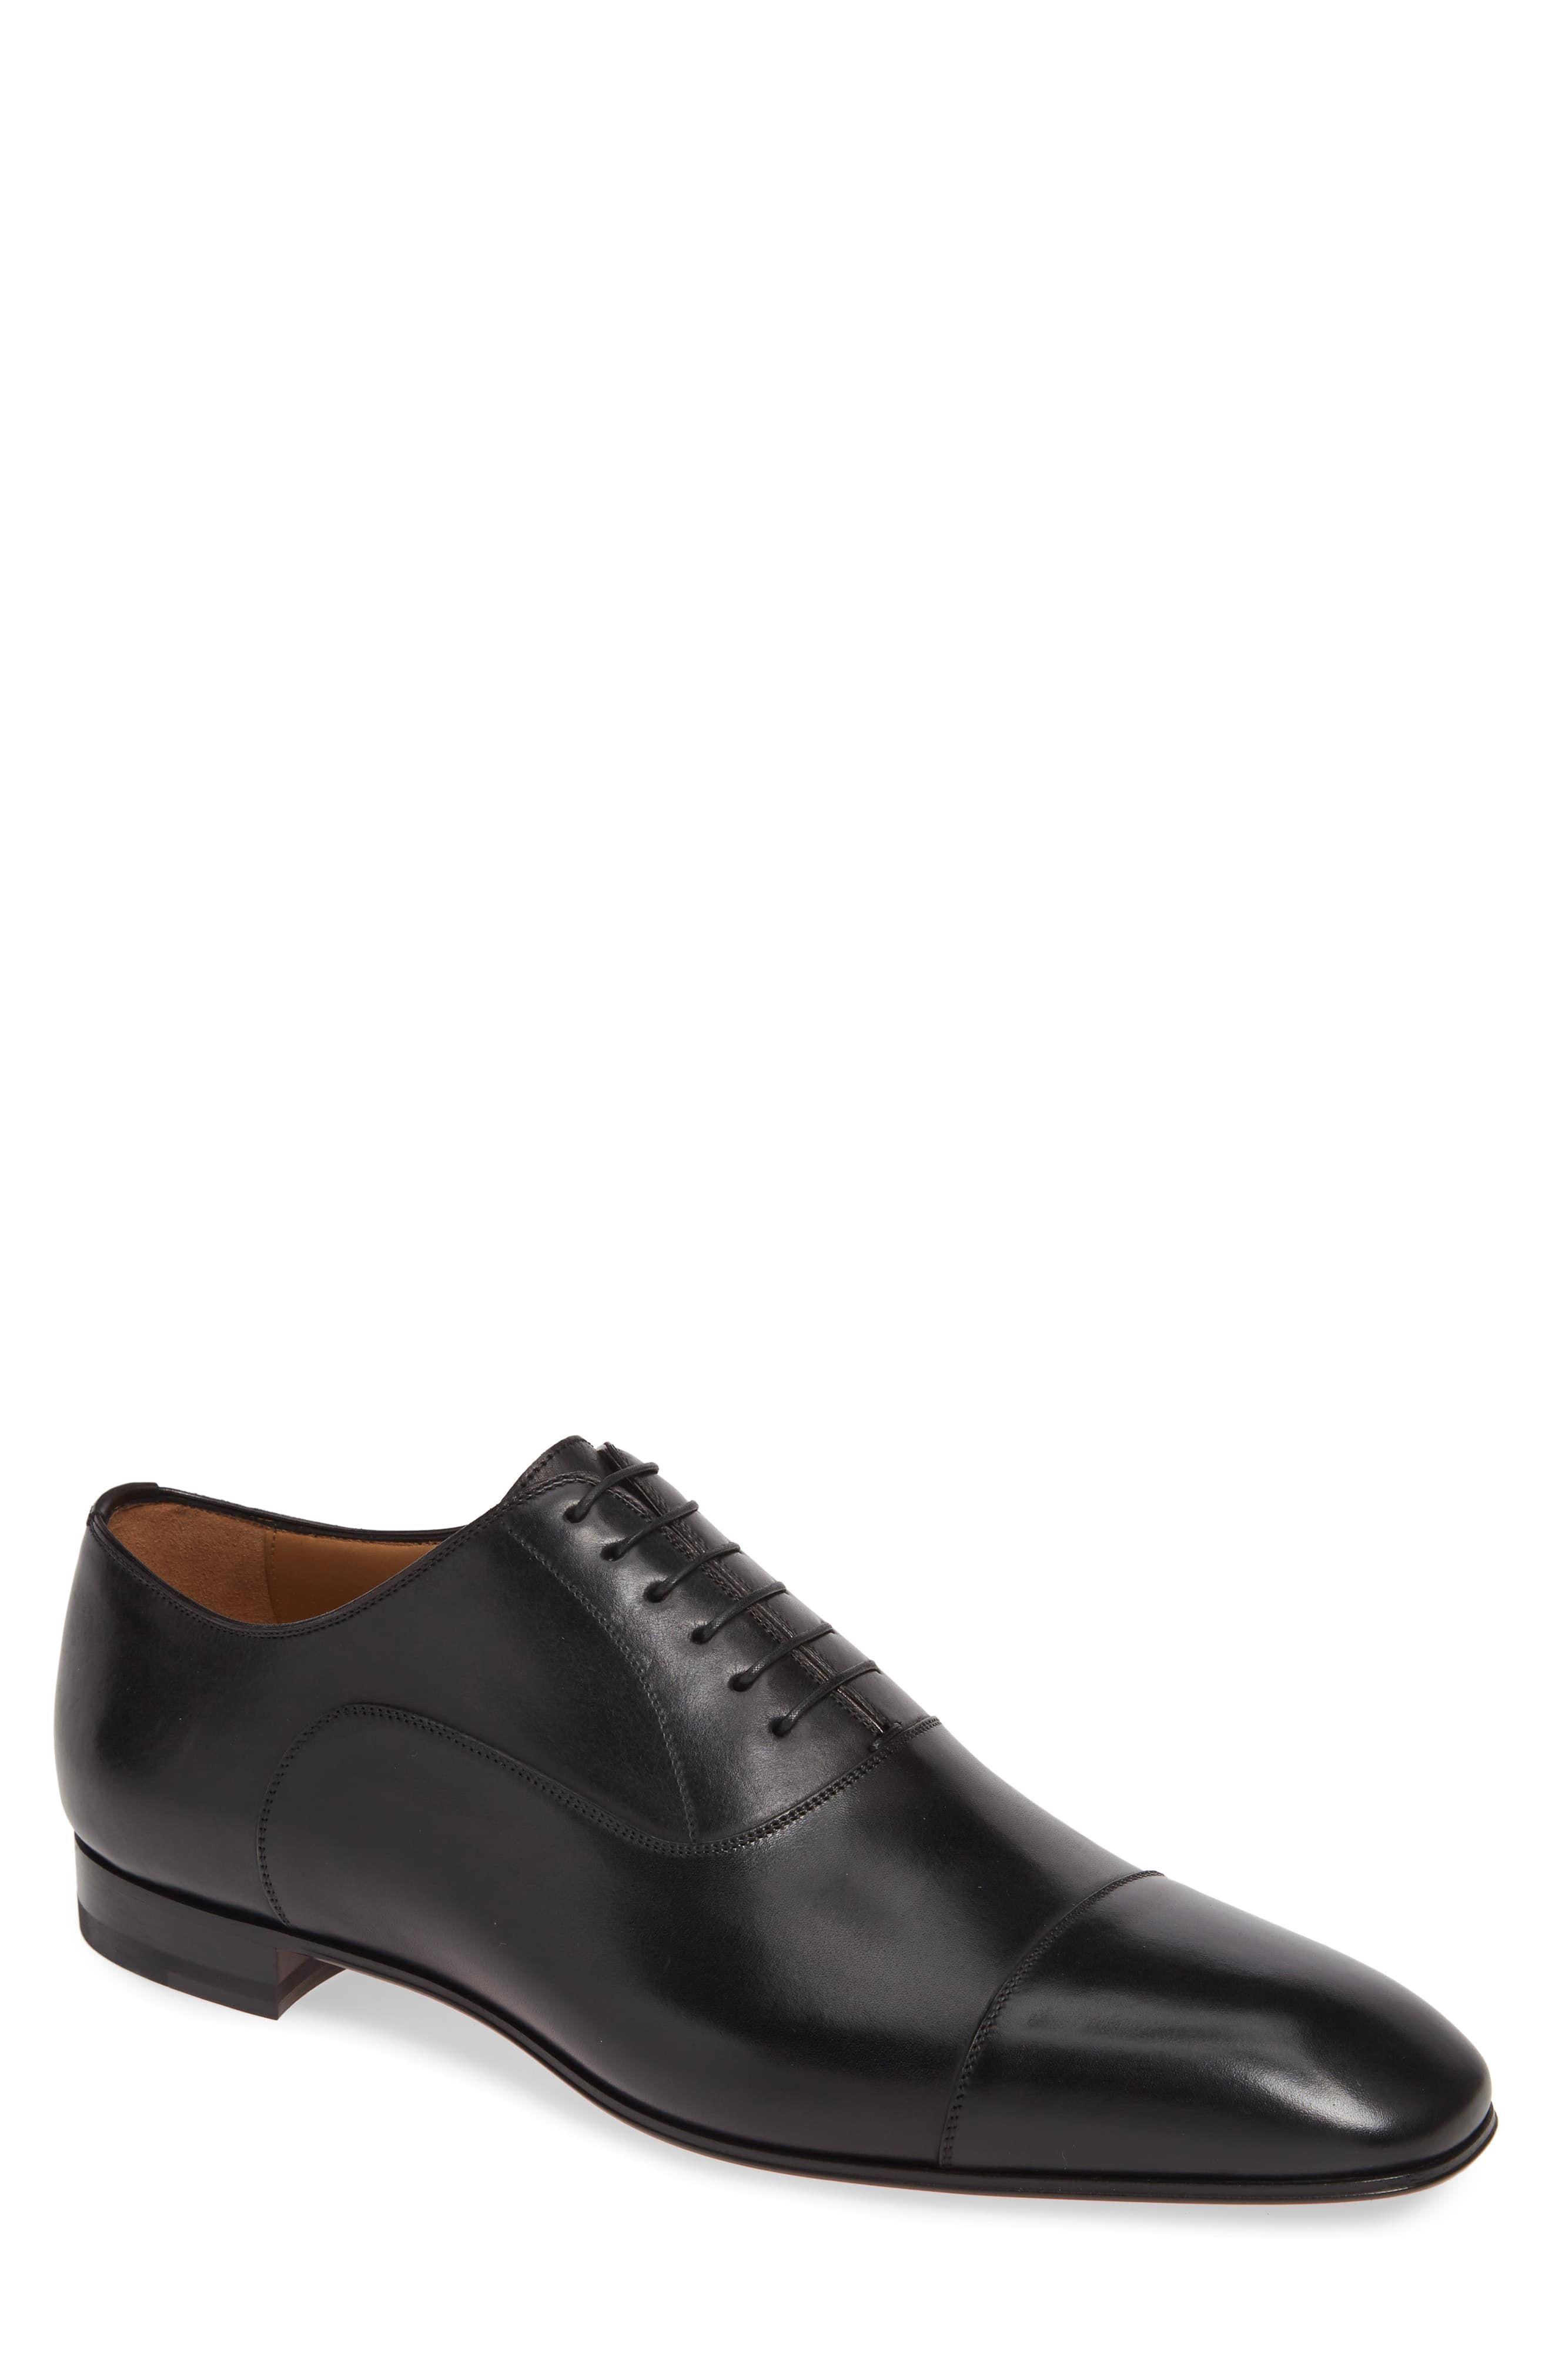 Christian Louboutin Greggo Cap Toe Oxford Men Nordstrom Dress Shoes Men Cap Toe Oxfords Oxford Dress Shoes [ 4048 x 2640 Pixel ]